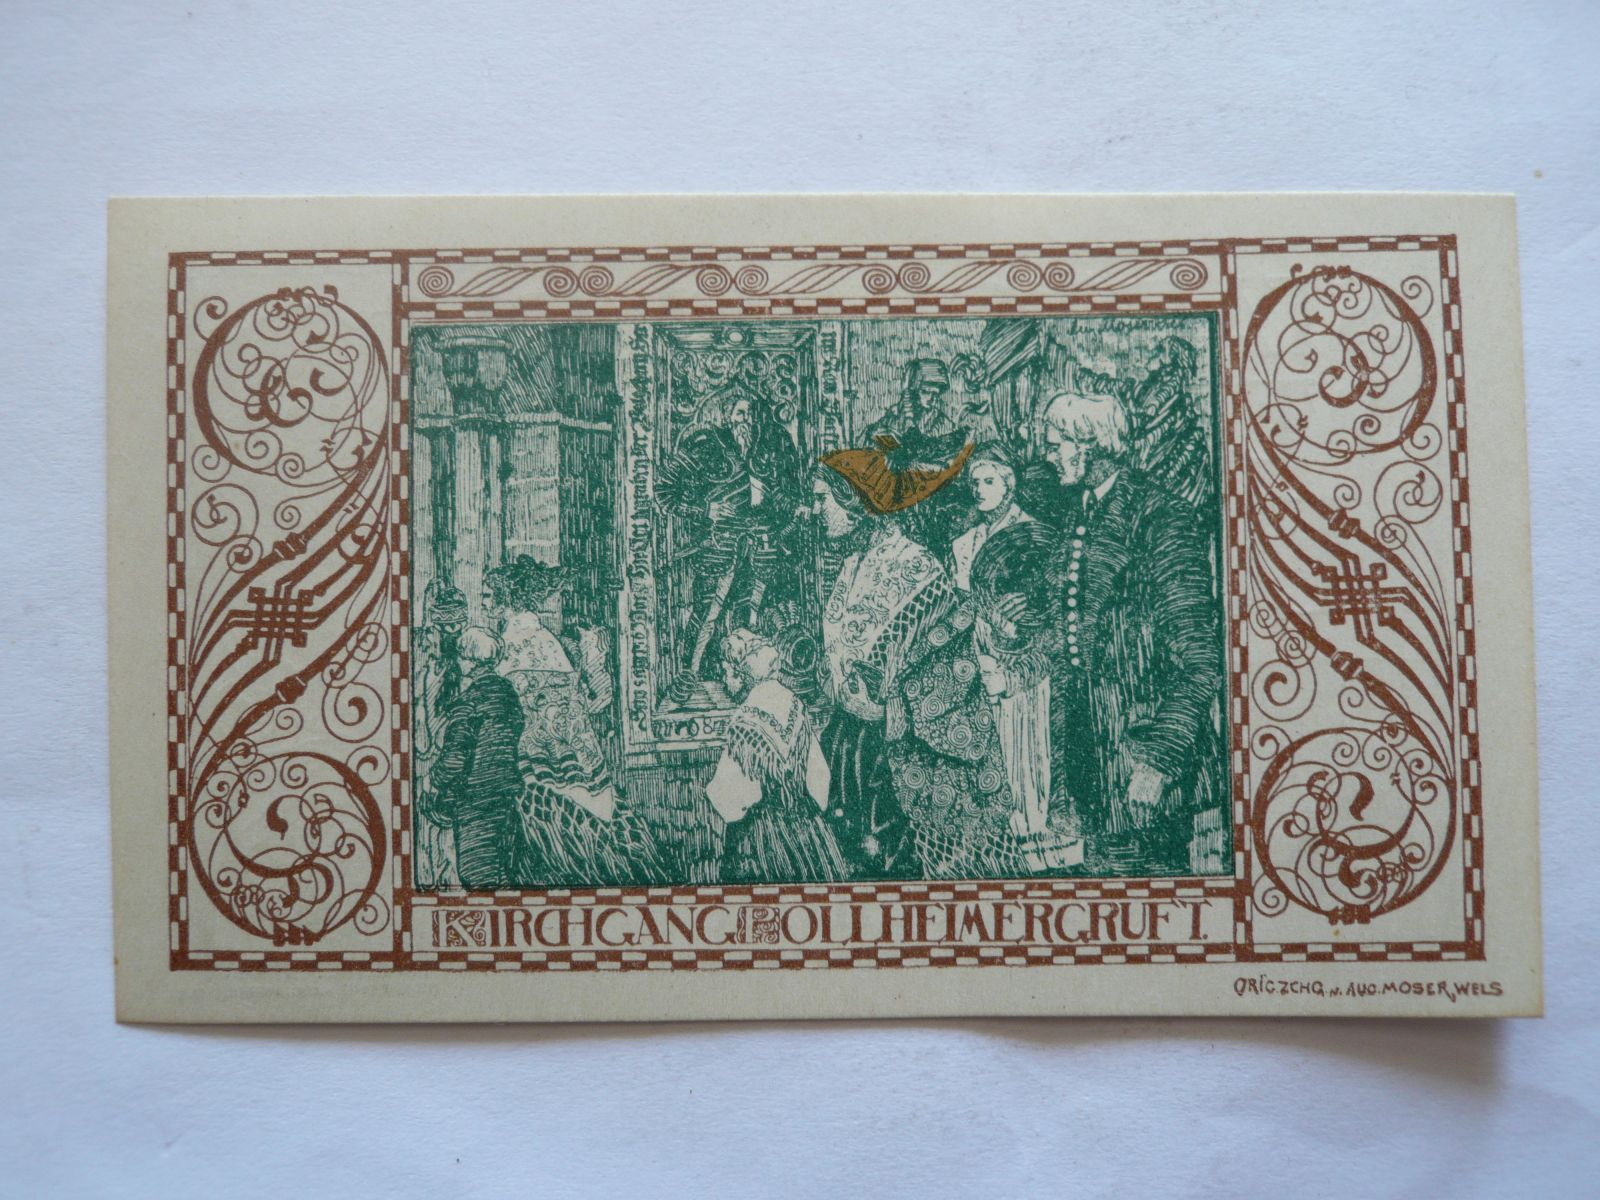 90 Heller, 1921, Rakousko